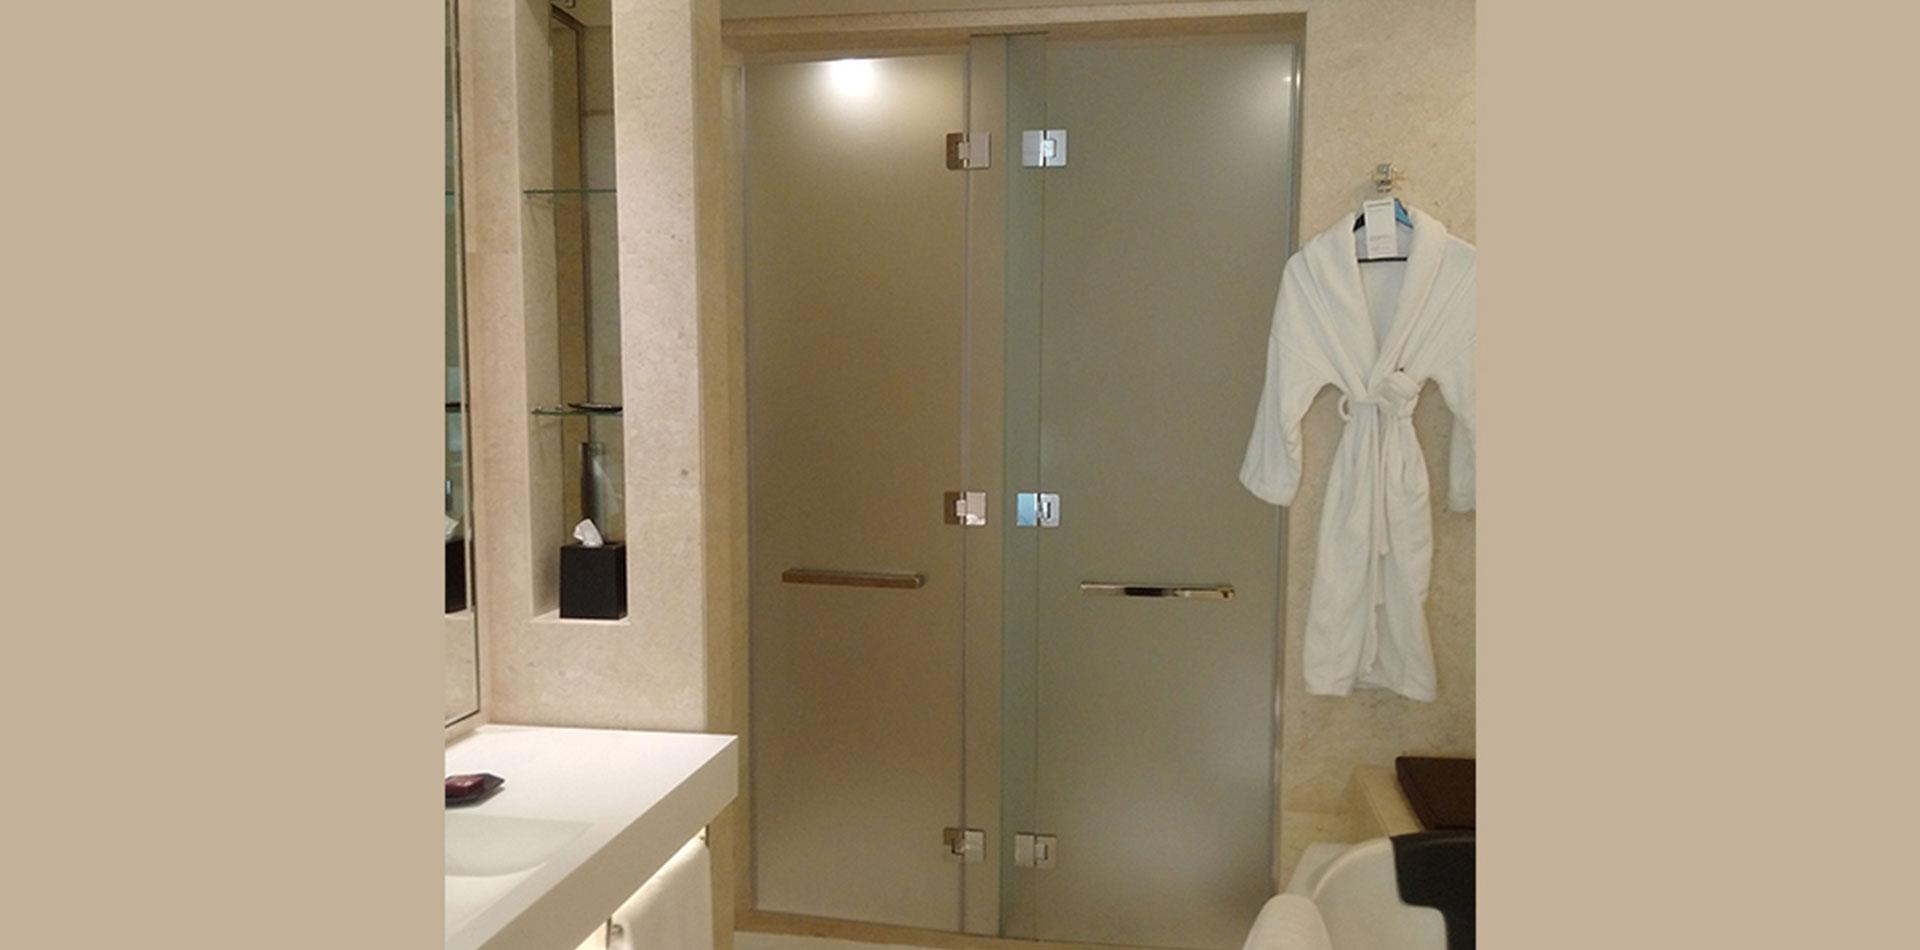 Glass Shower Enclosure For Home Professional Use Joseph